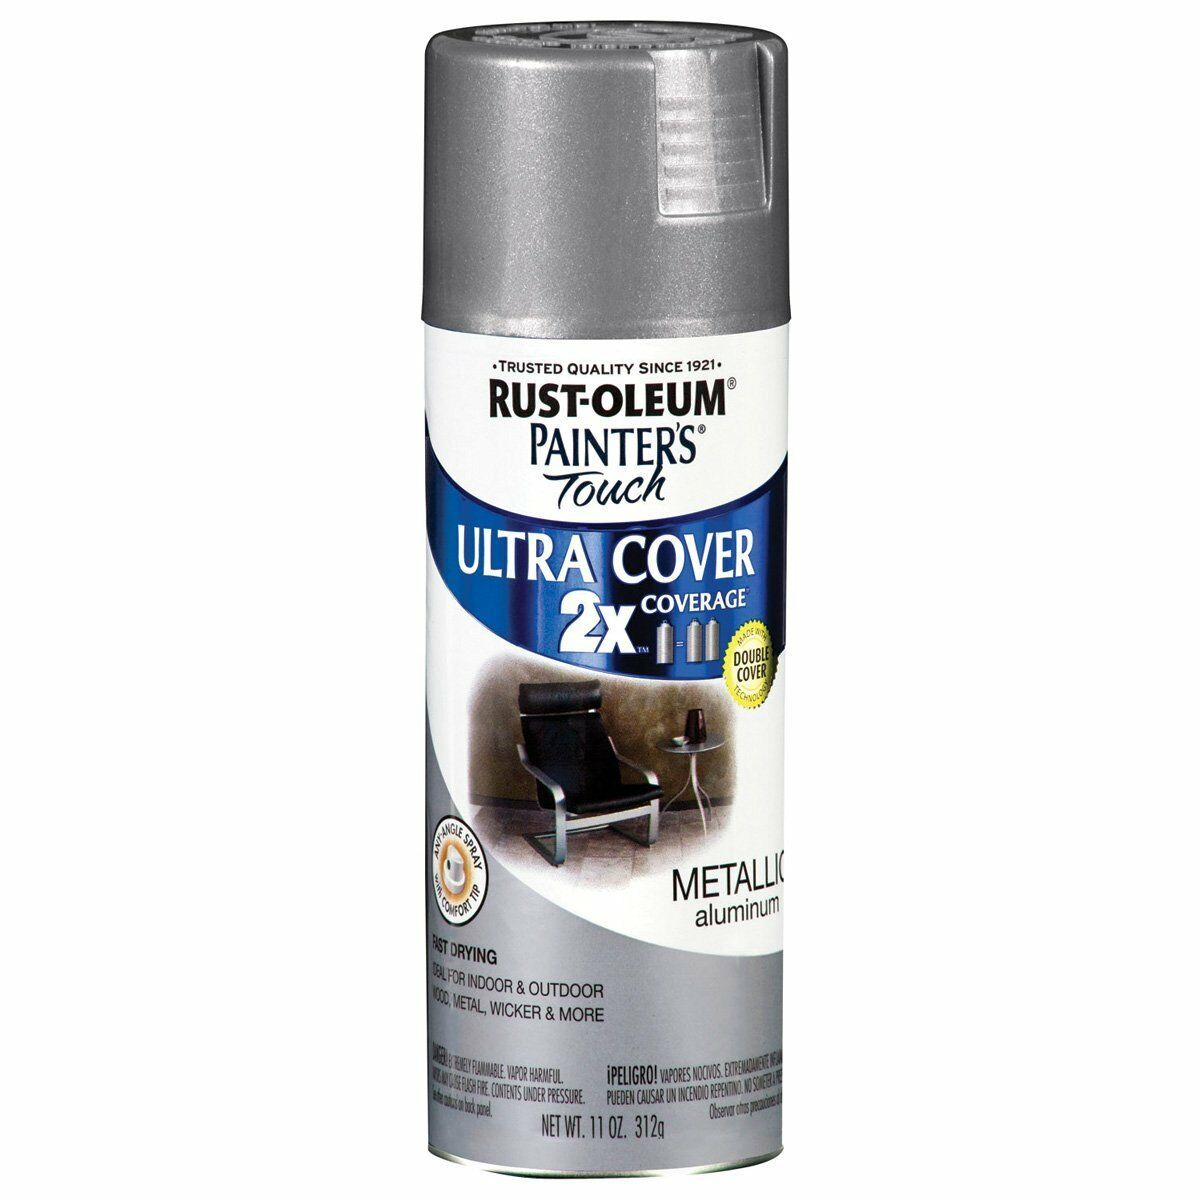 Rust-Oleum Painters Touch 2x Metallic Aluminum Spray Paint ...